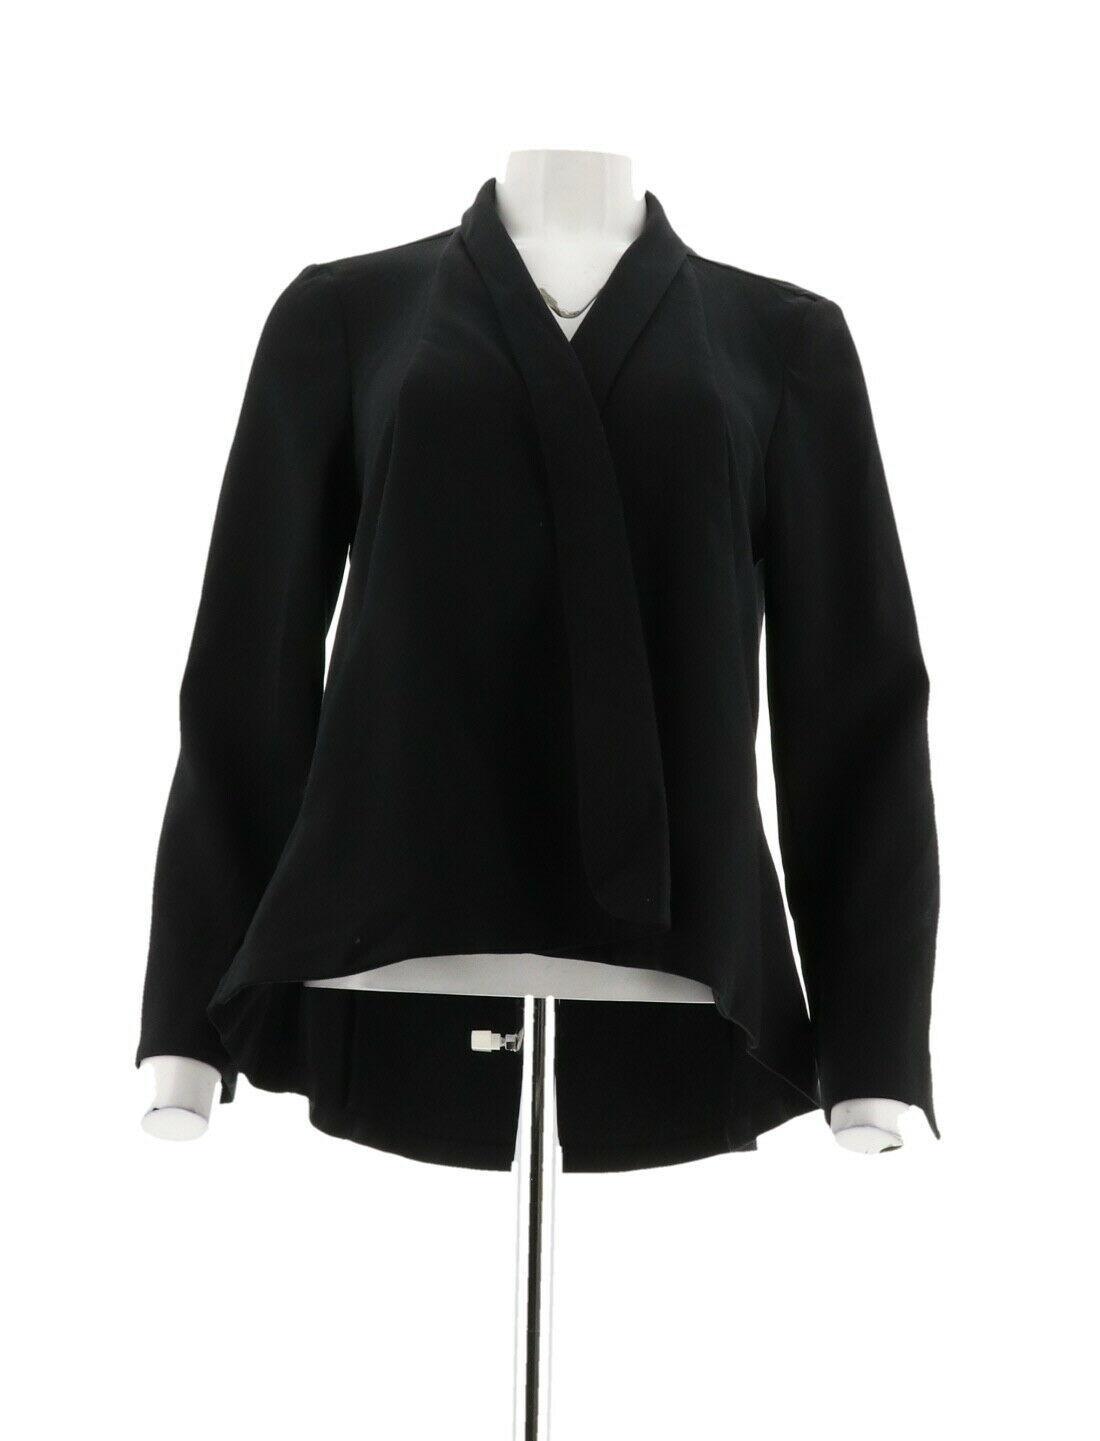 H Halston Long Slv Open Front Jacket Seam Black 12 NEW A303200